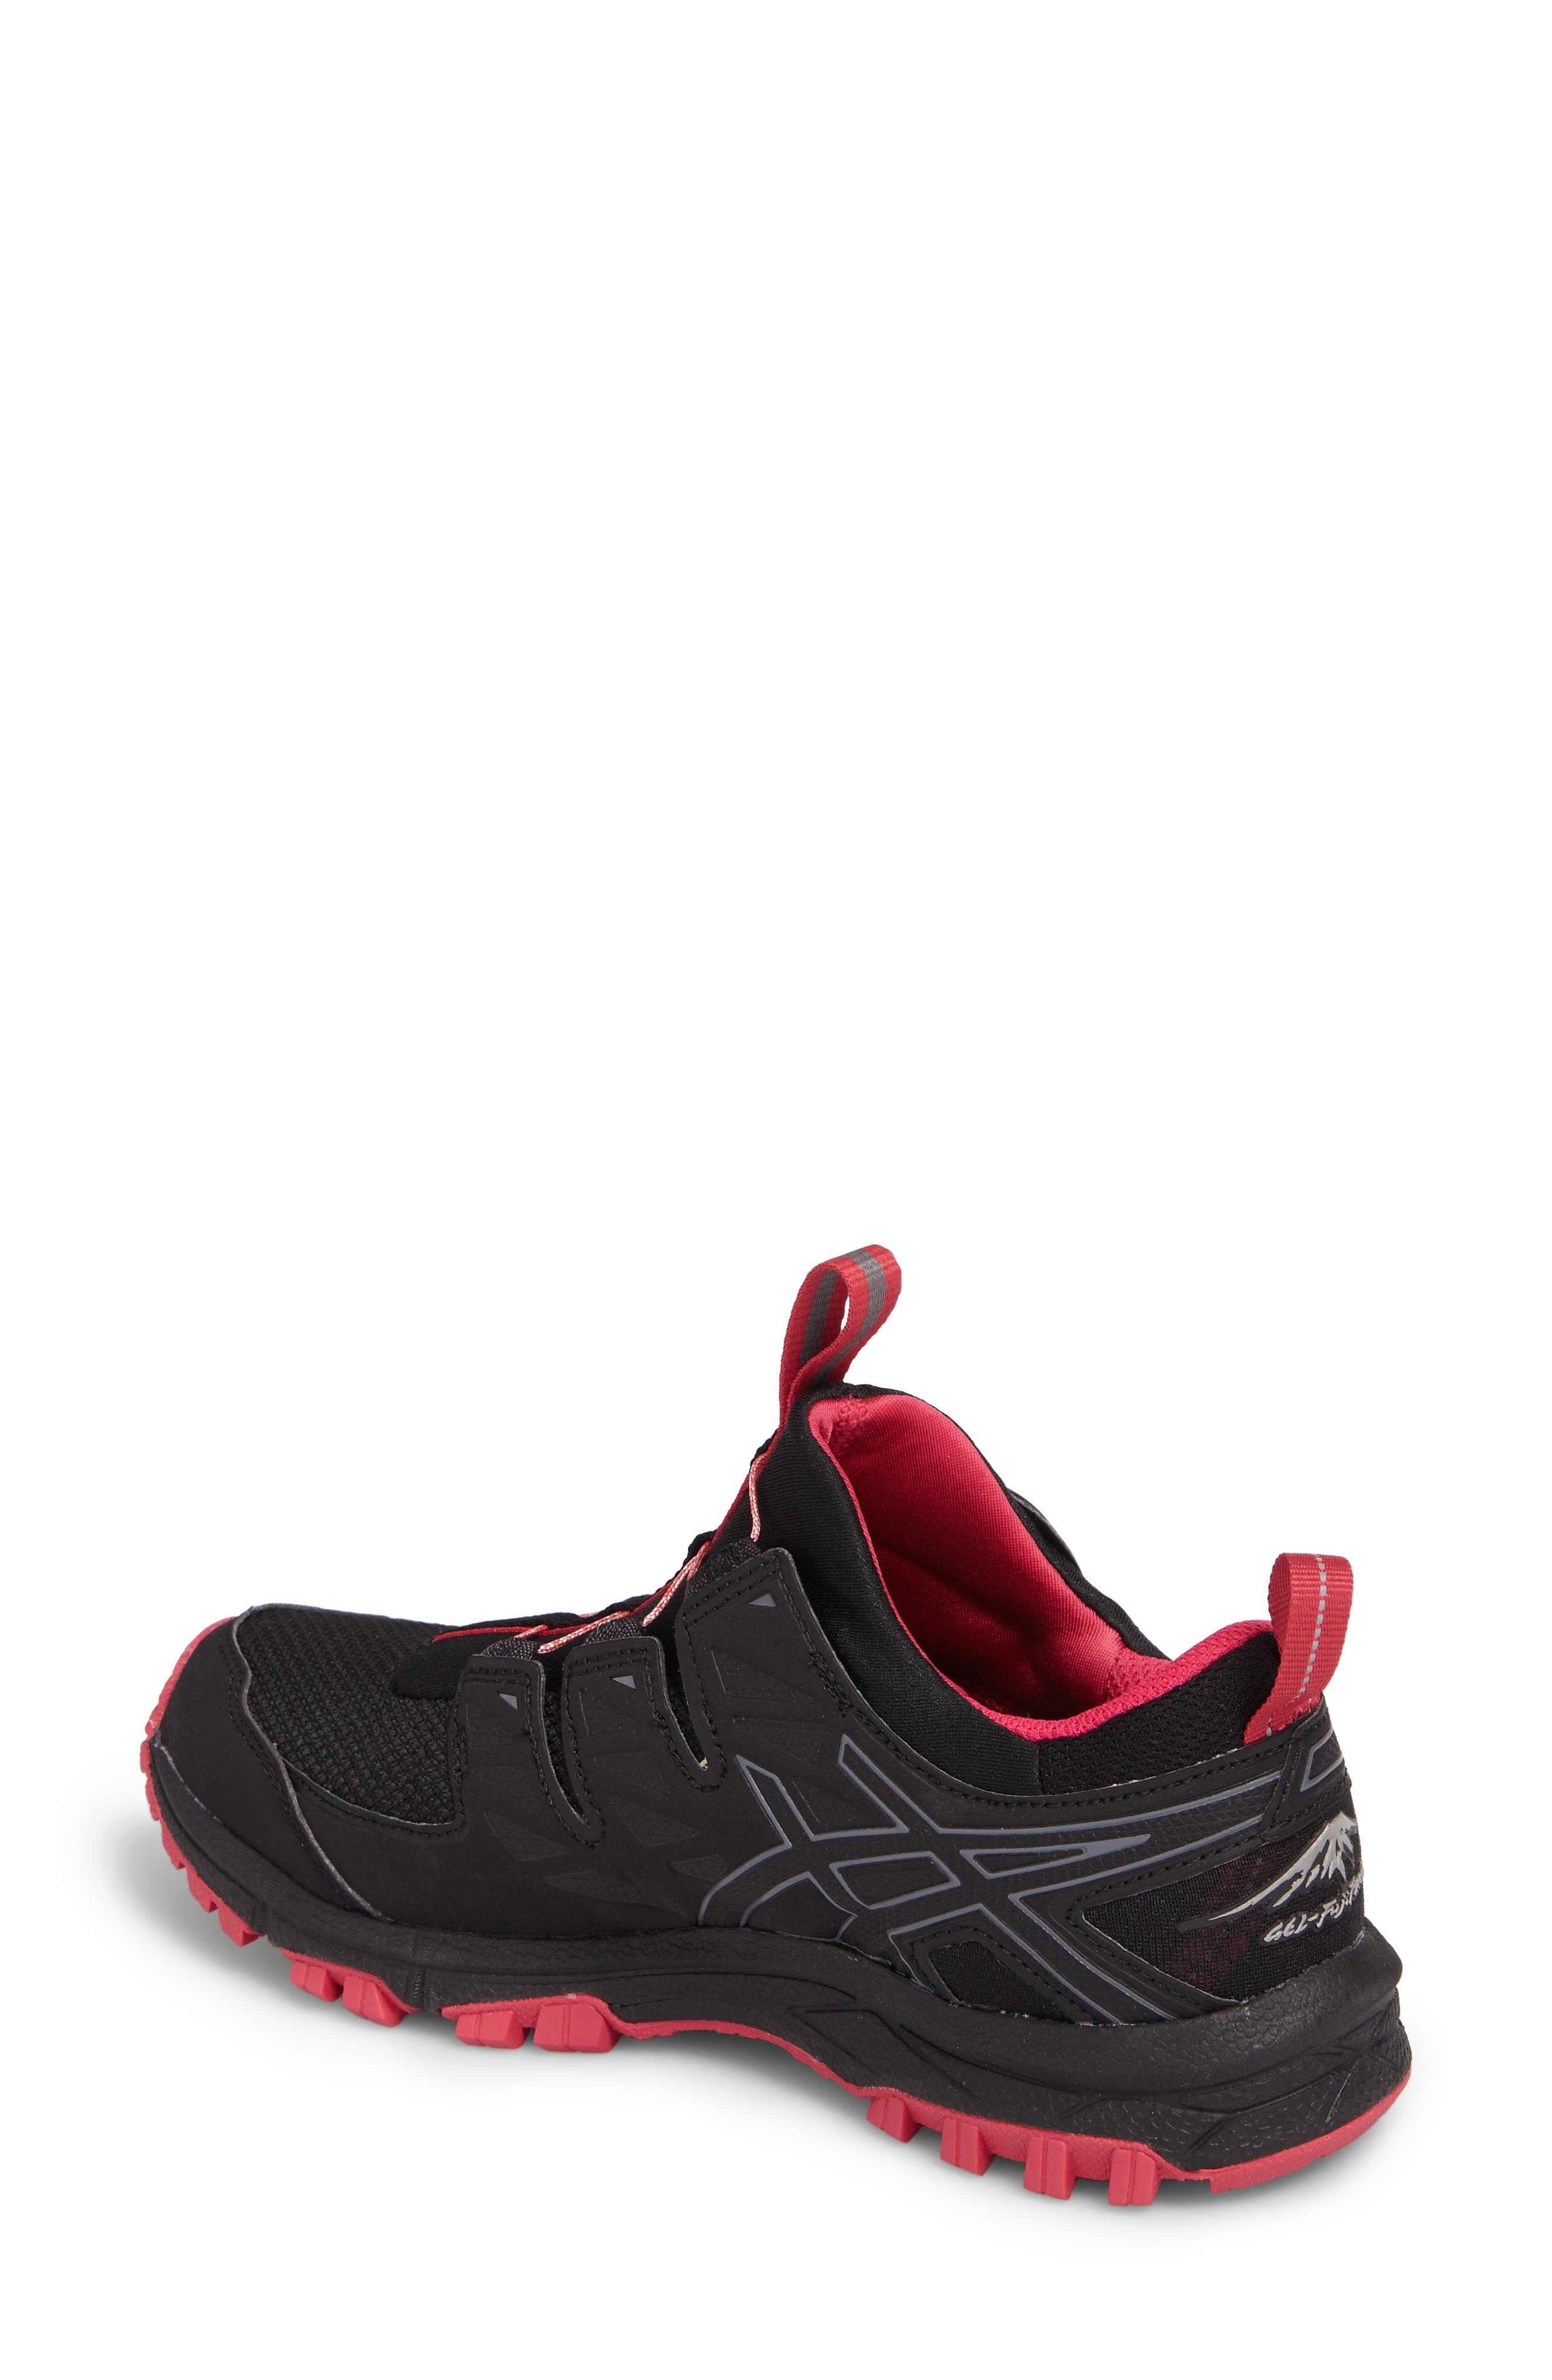 GEL-Fujirado Running Shoe,                             Alternate thumbnail 2, color,                             Black/ Carbon/ Cosmo Pink